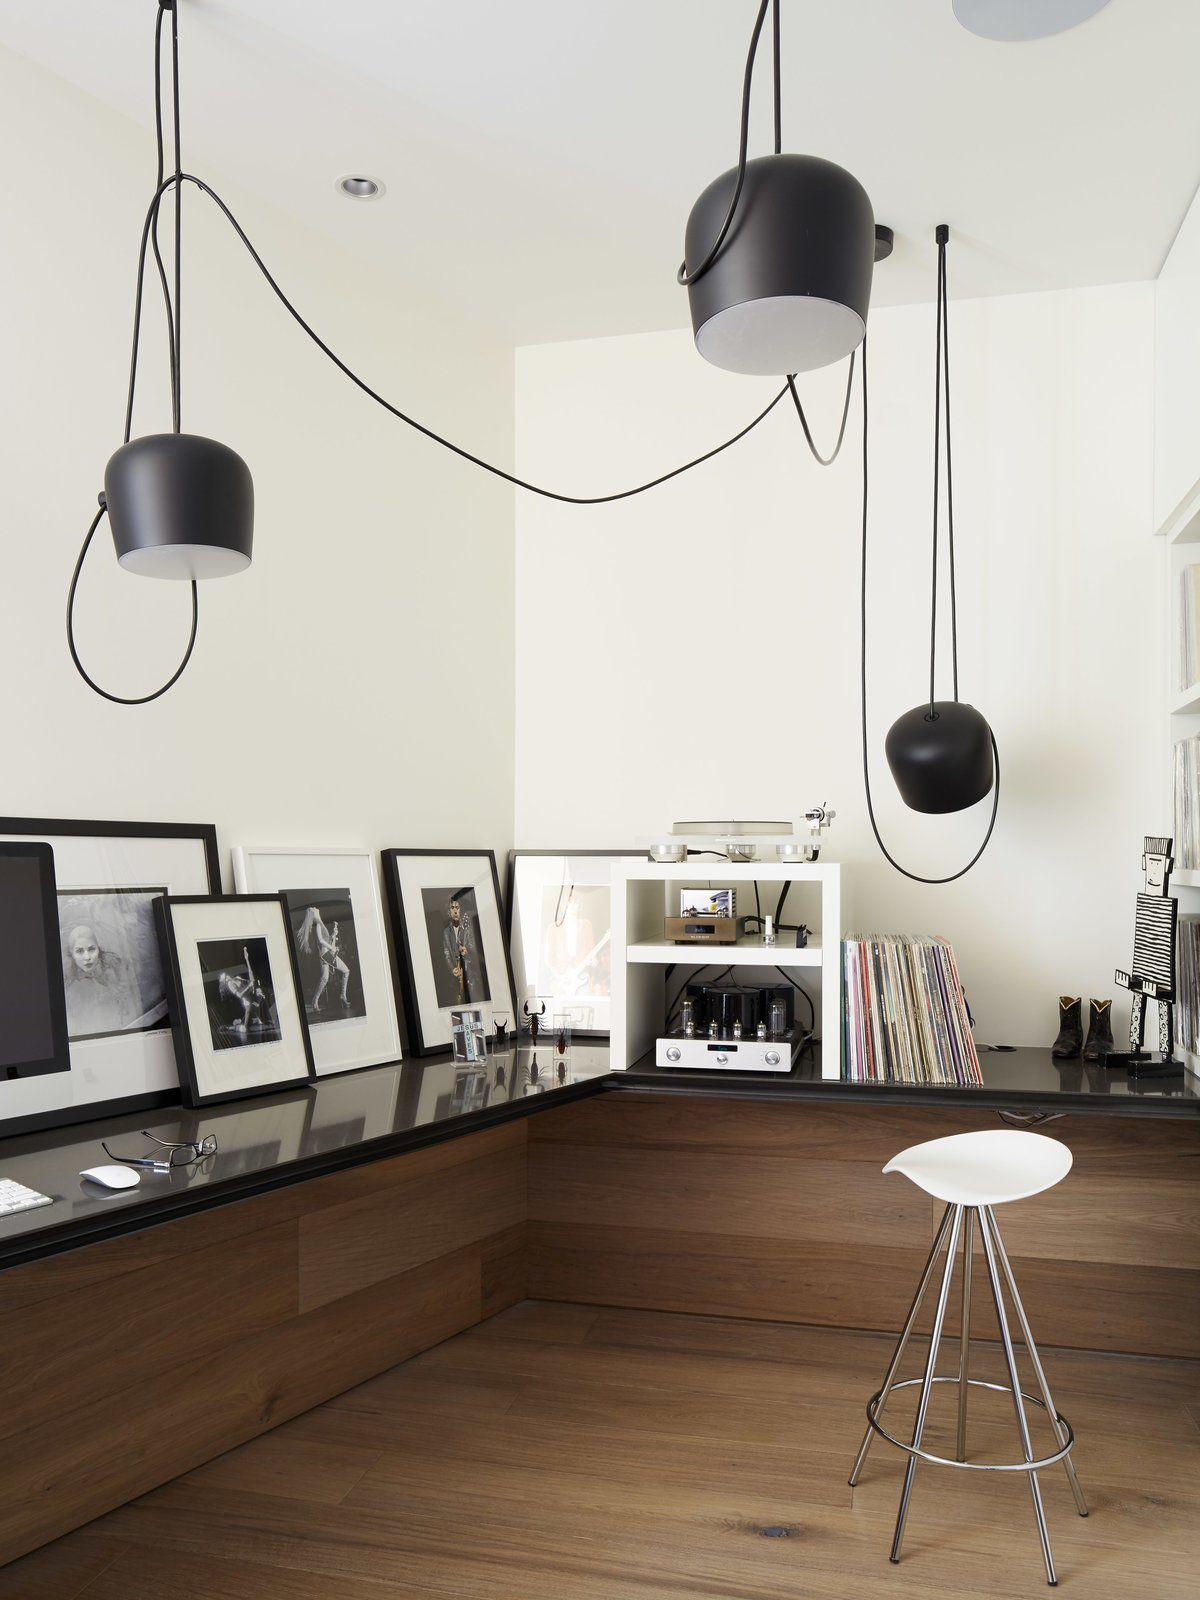 The E Incorporates Modern Home Office Ideas Like Sleek Black Countertops That